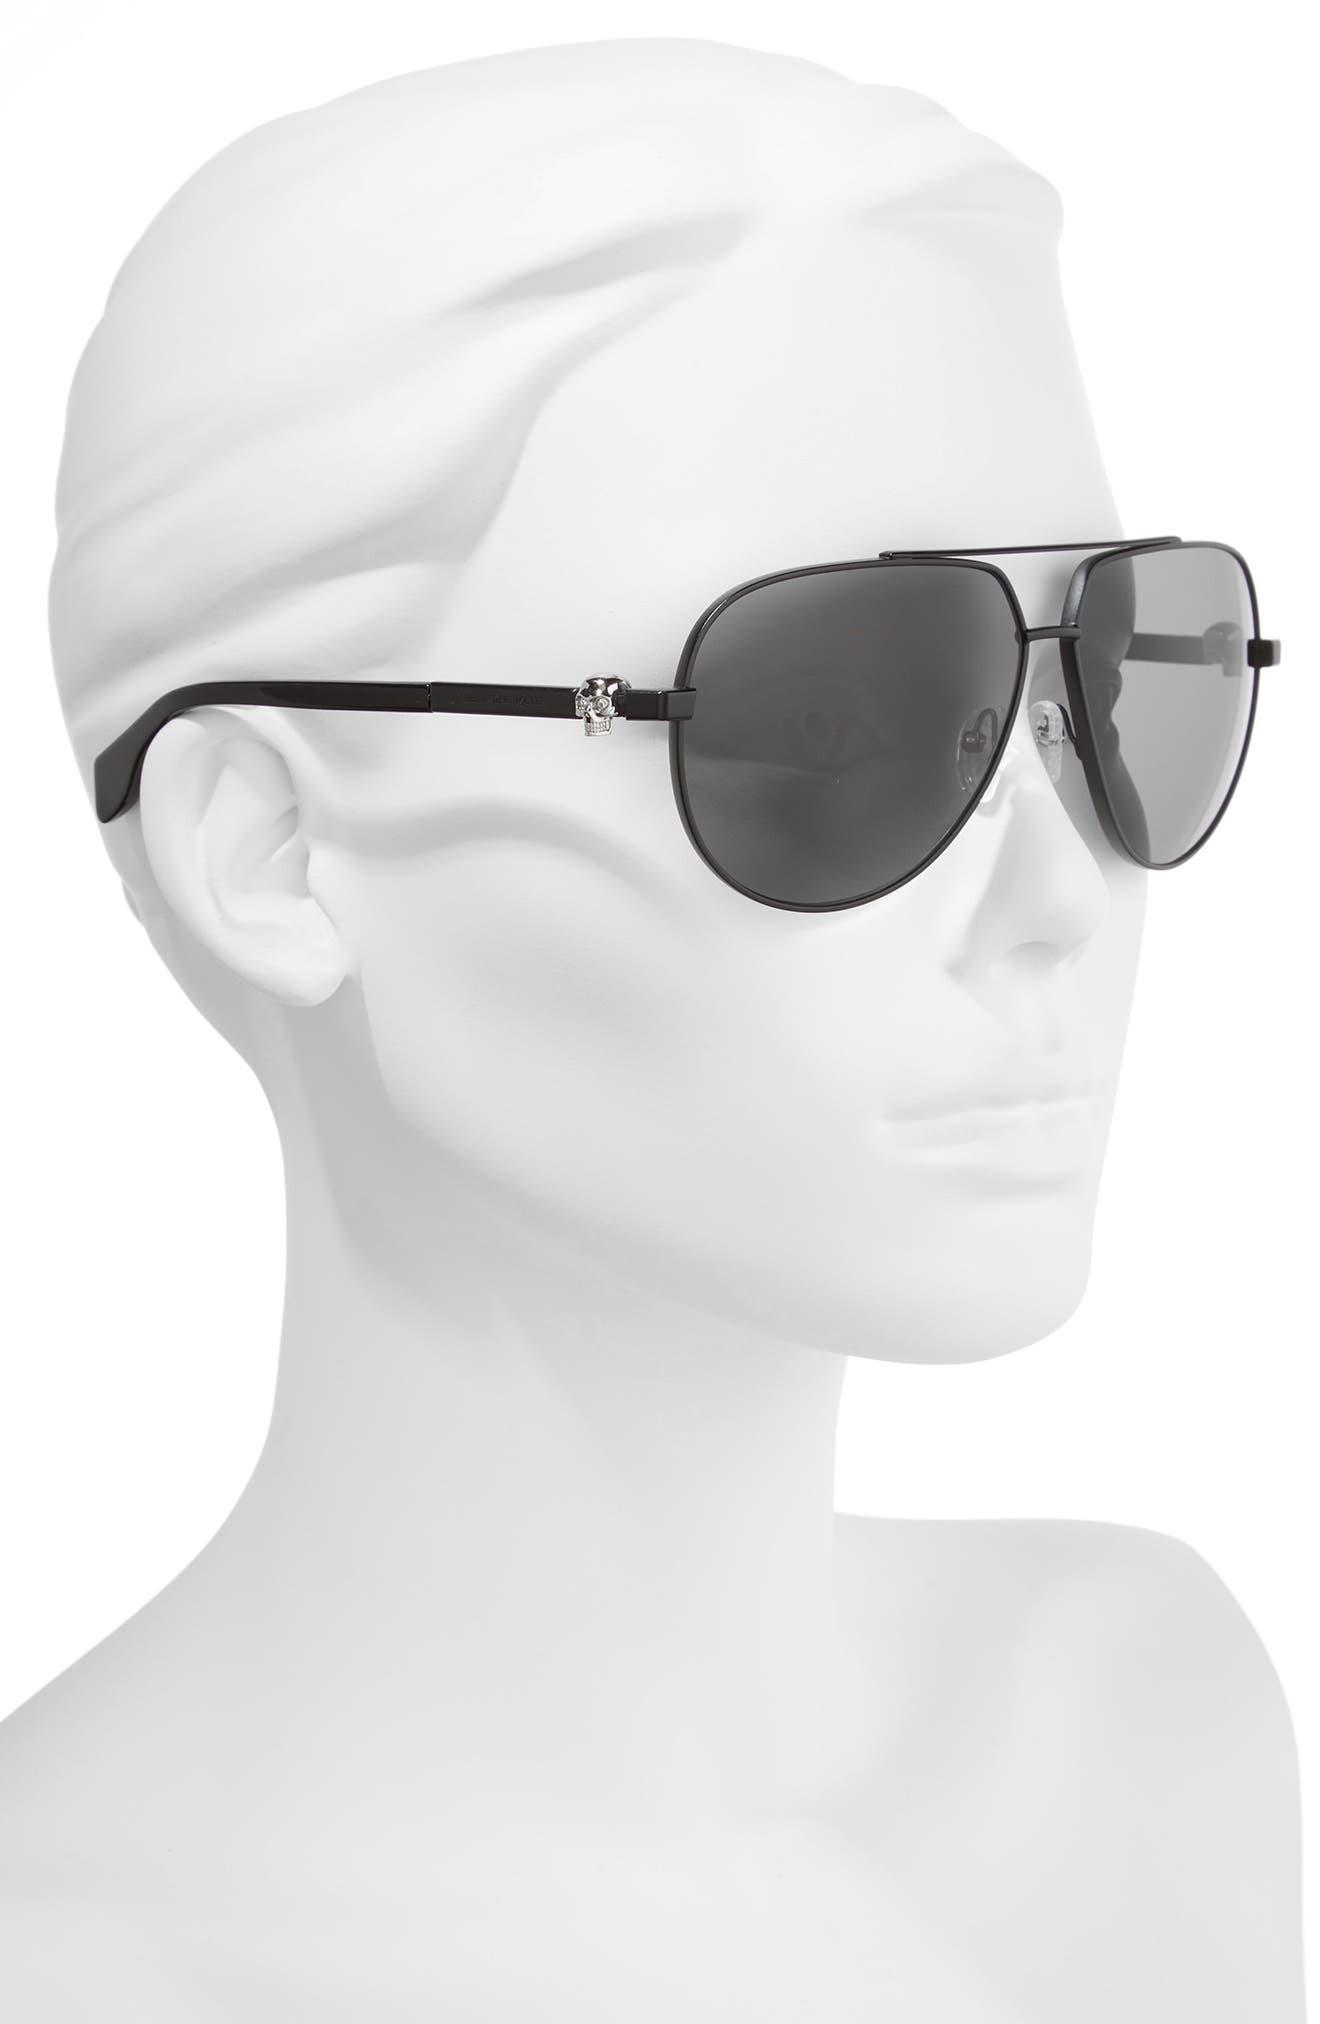 63mm Aviator Sunglasses,                             Alternate thumbnail 2, color,                             001